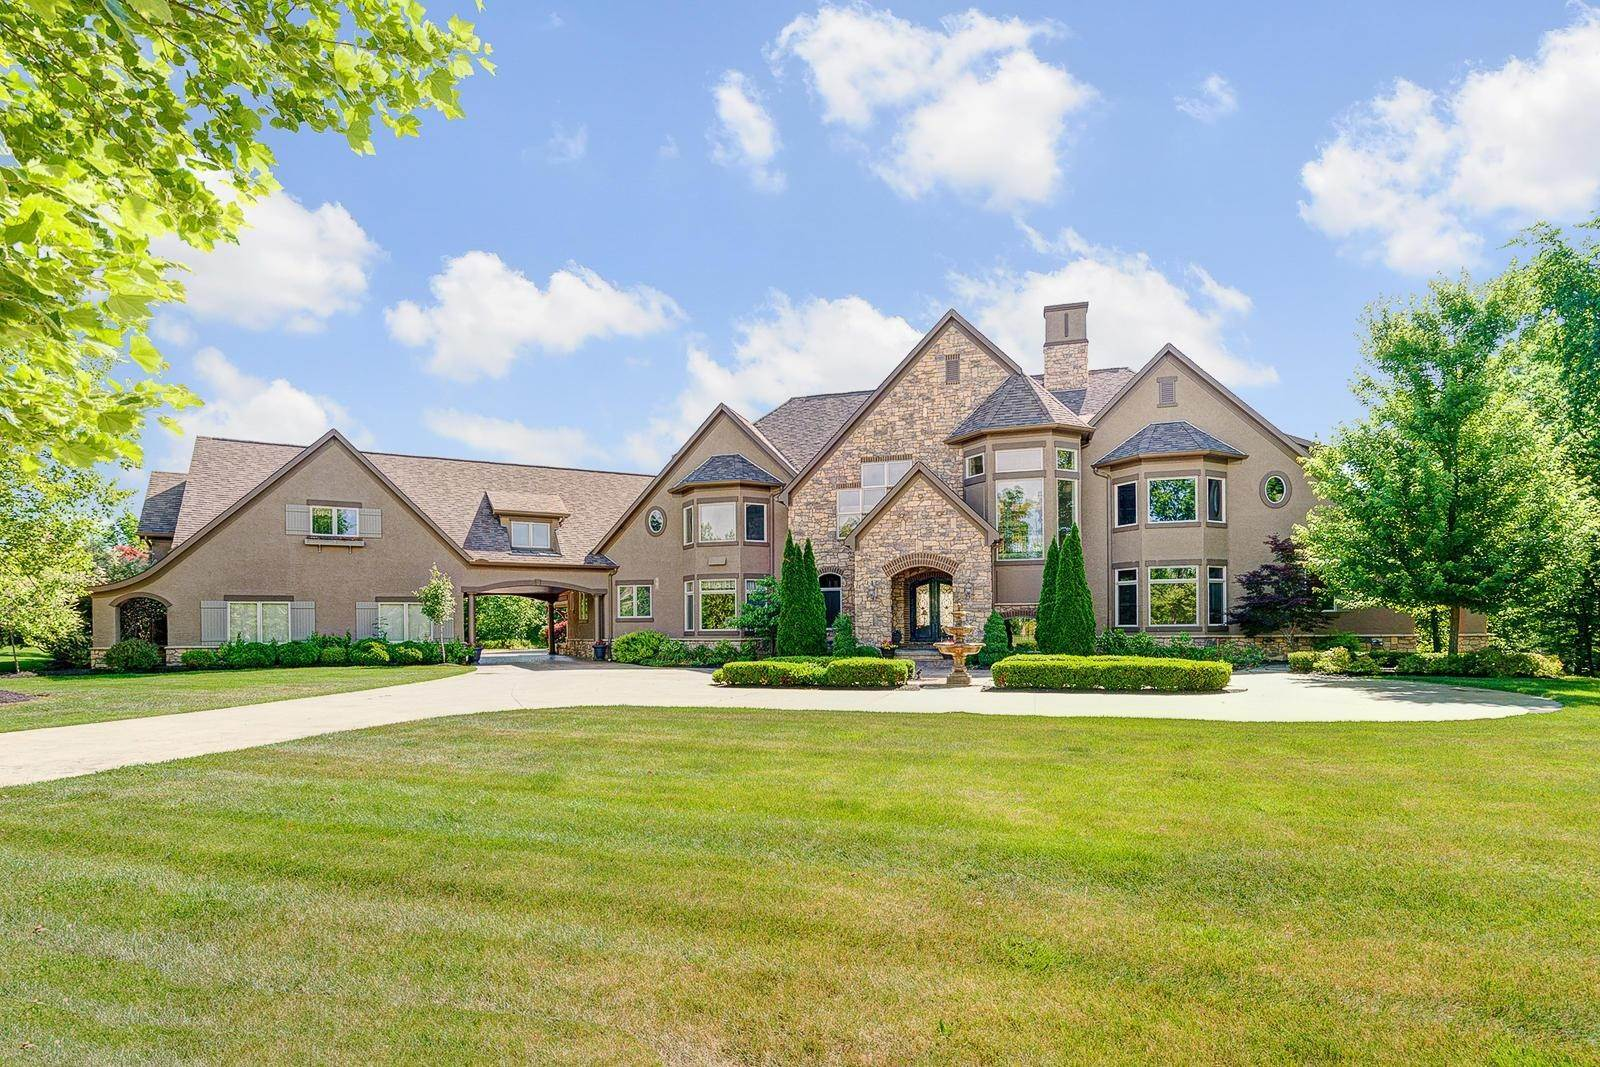 Single Family Homes for Sale at 7016 Bordeaux Dublin, Ohio 43016 United States